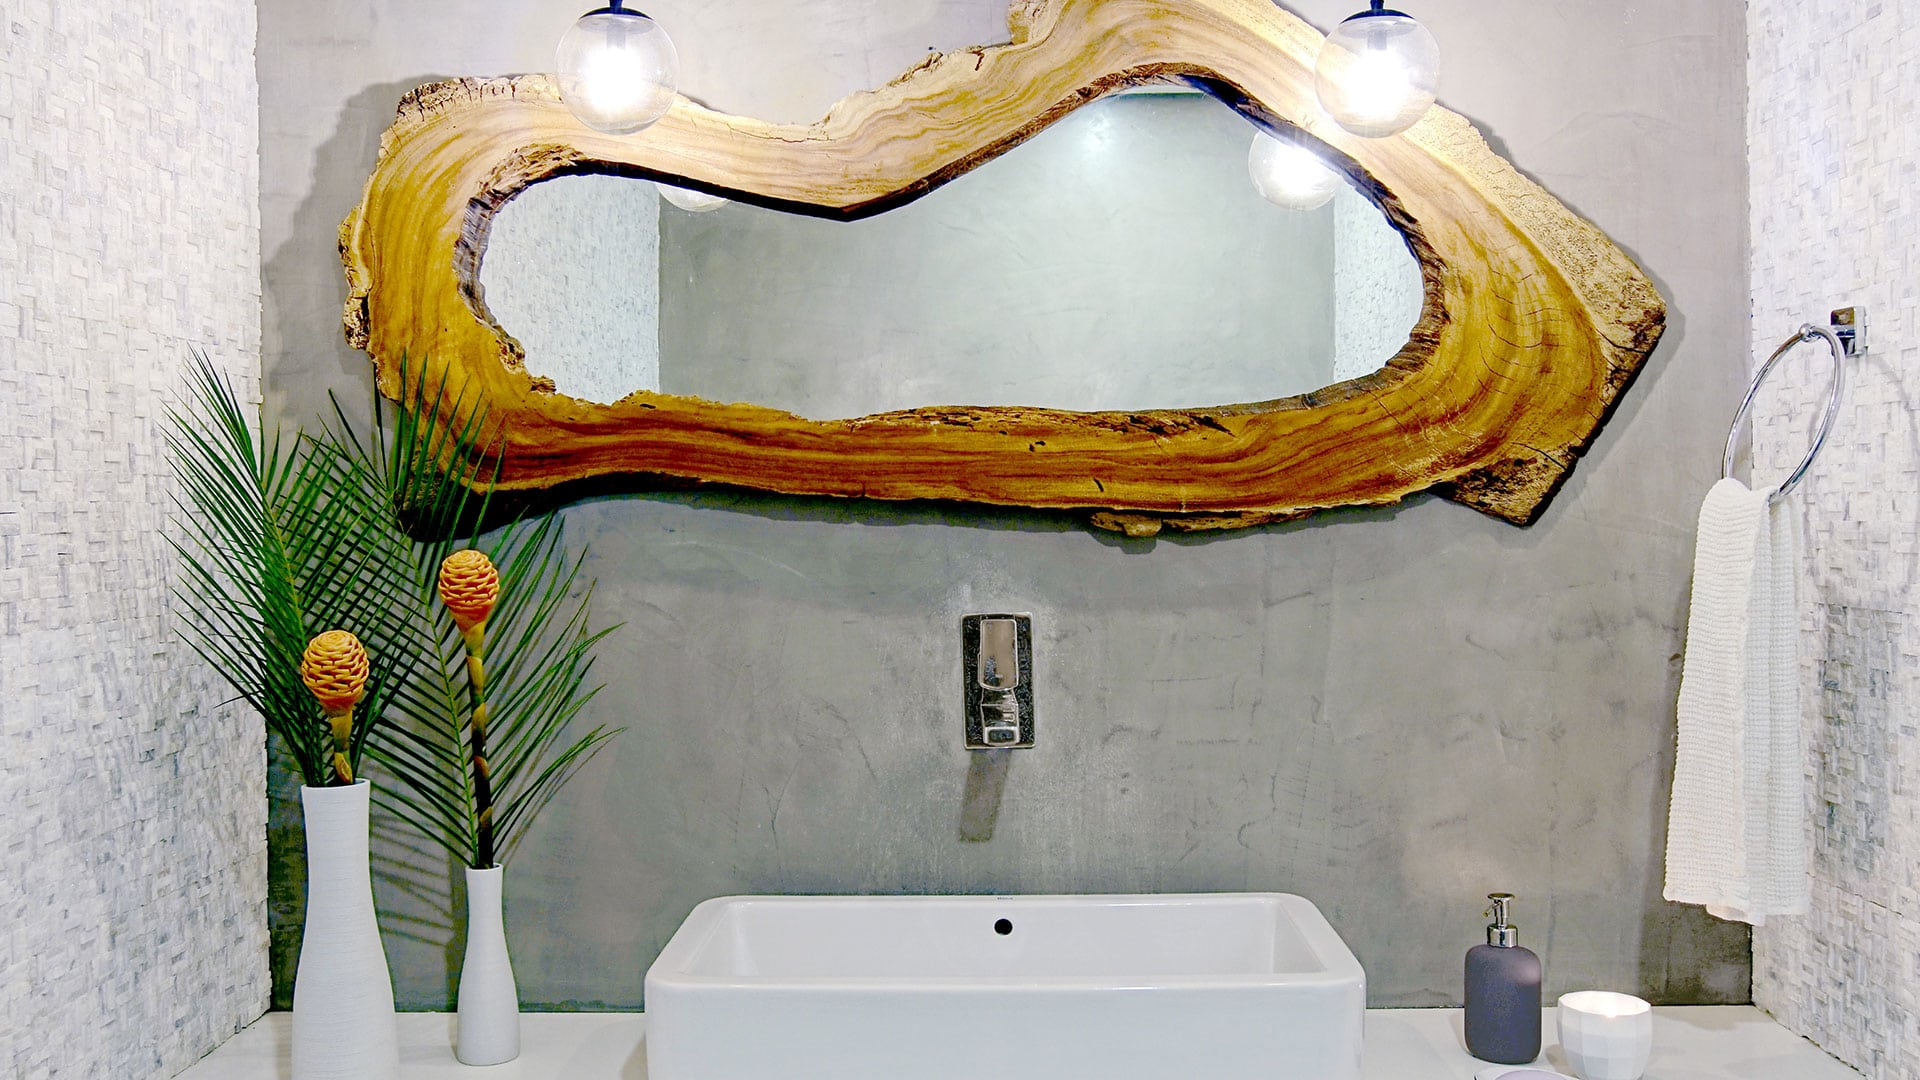 Casa Frisons Bathroom Sink & Toilet